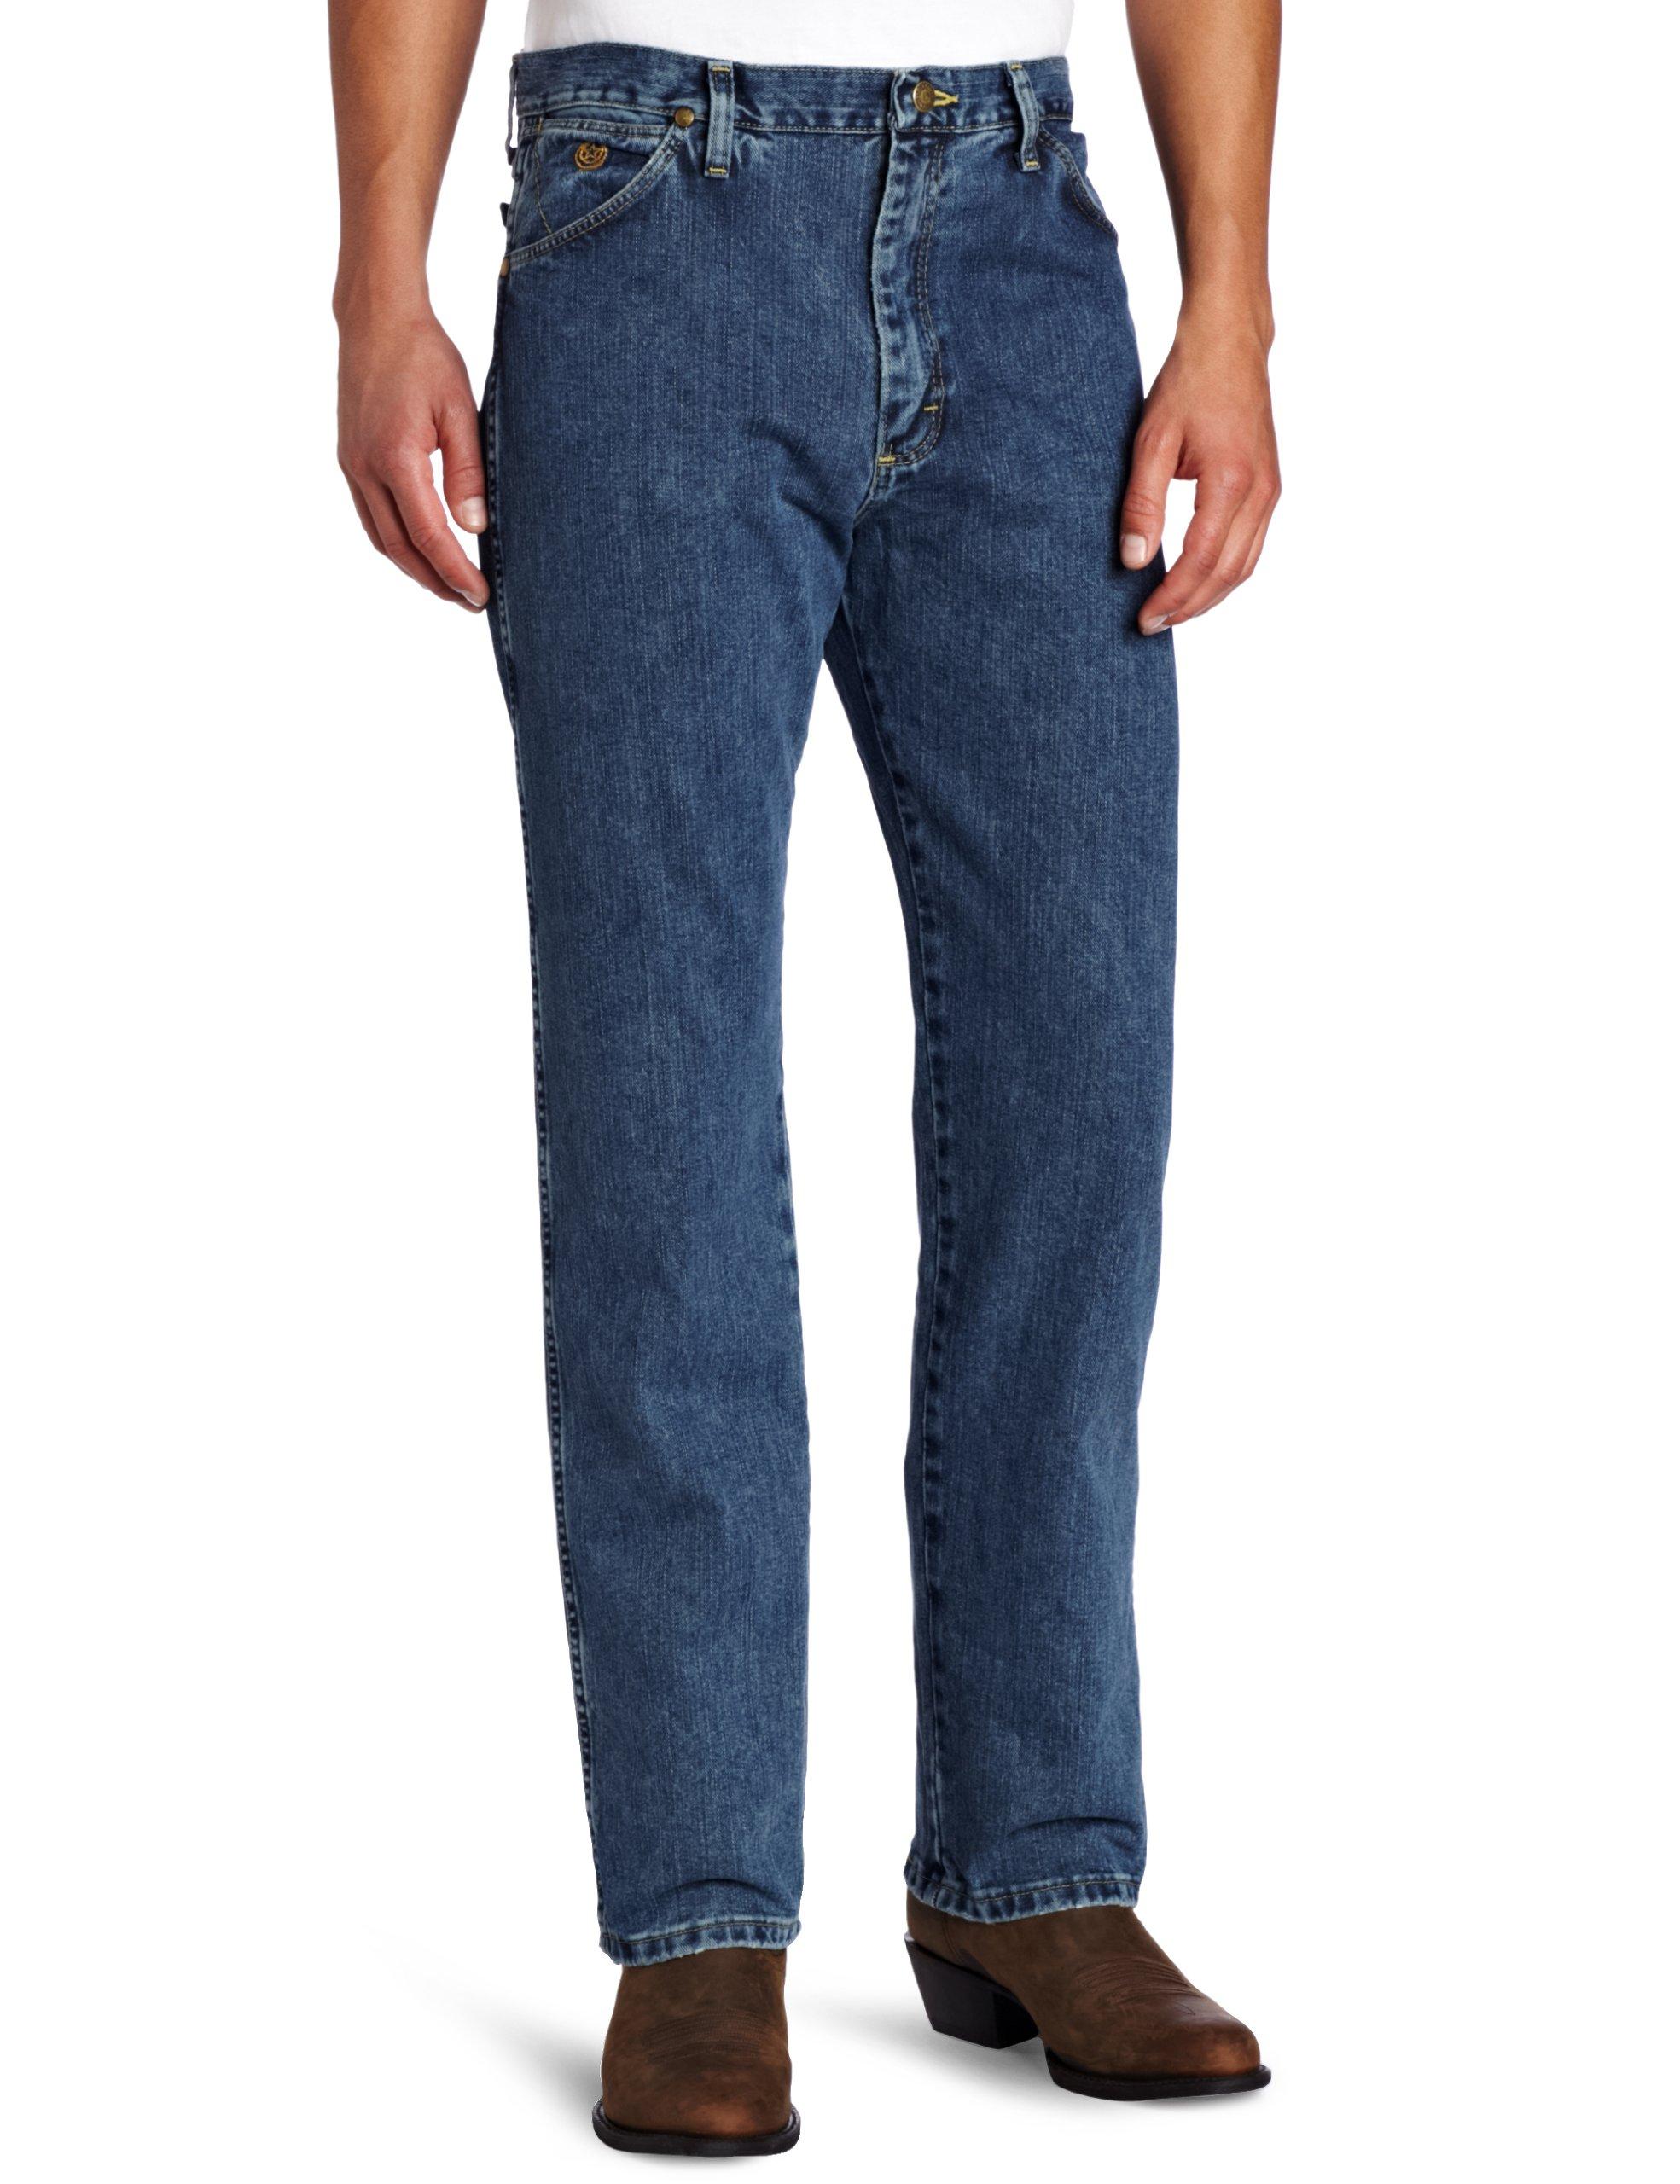 Wrangler Men's George Strait Cowboy Cut Original Fit Jean , Greyed Denim, 34W x 34L